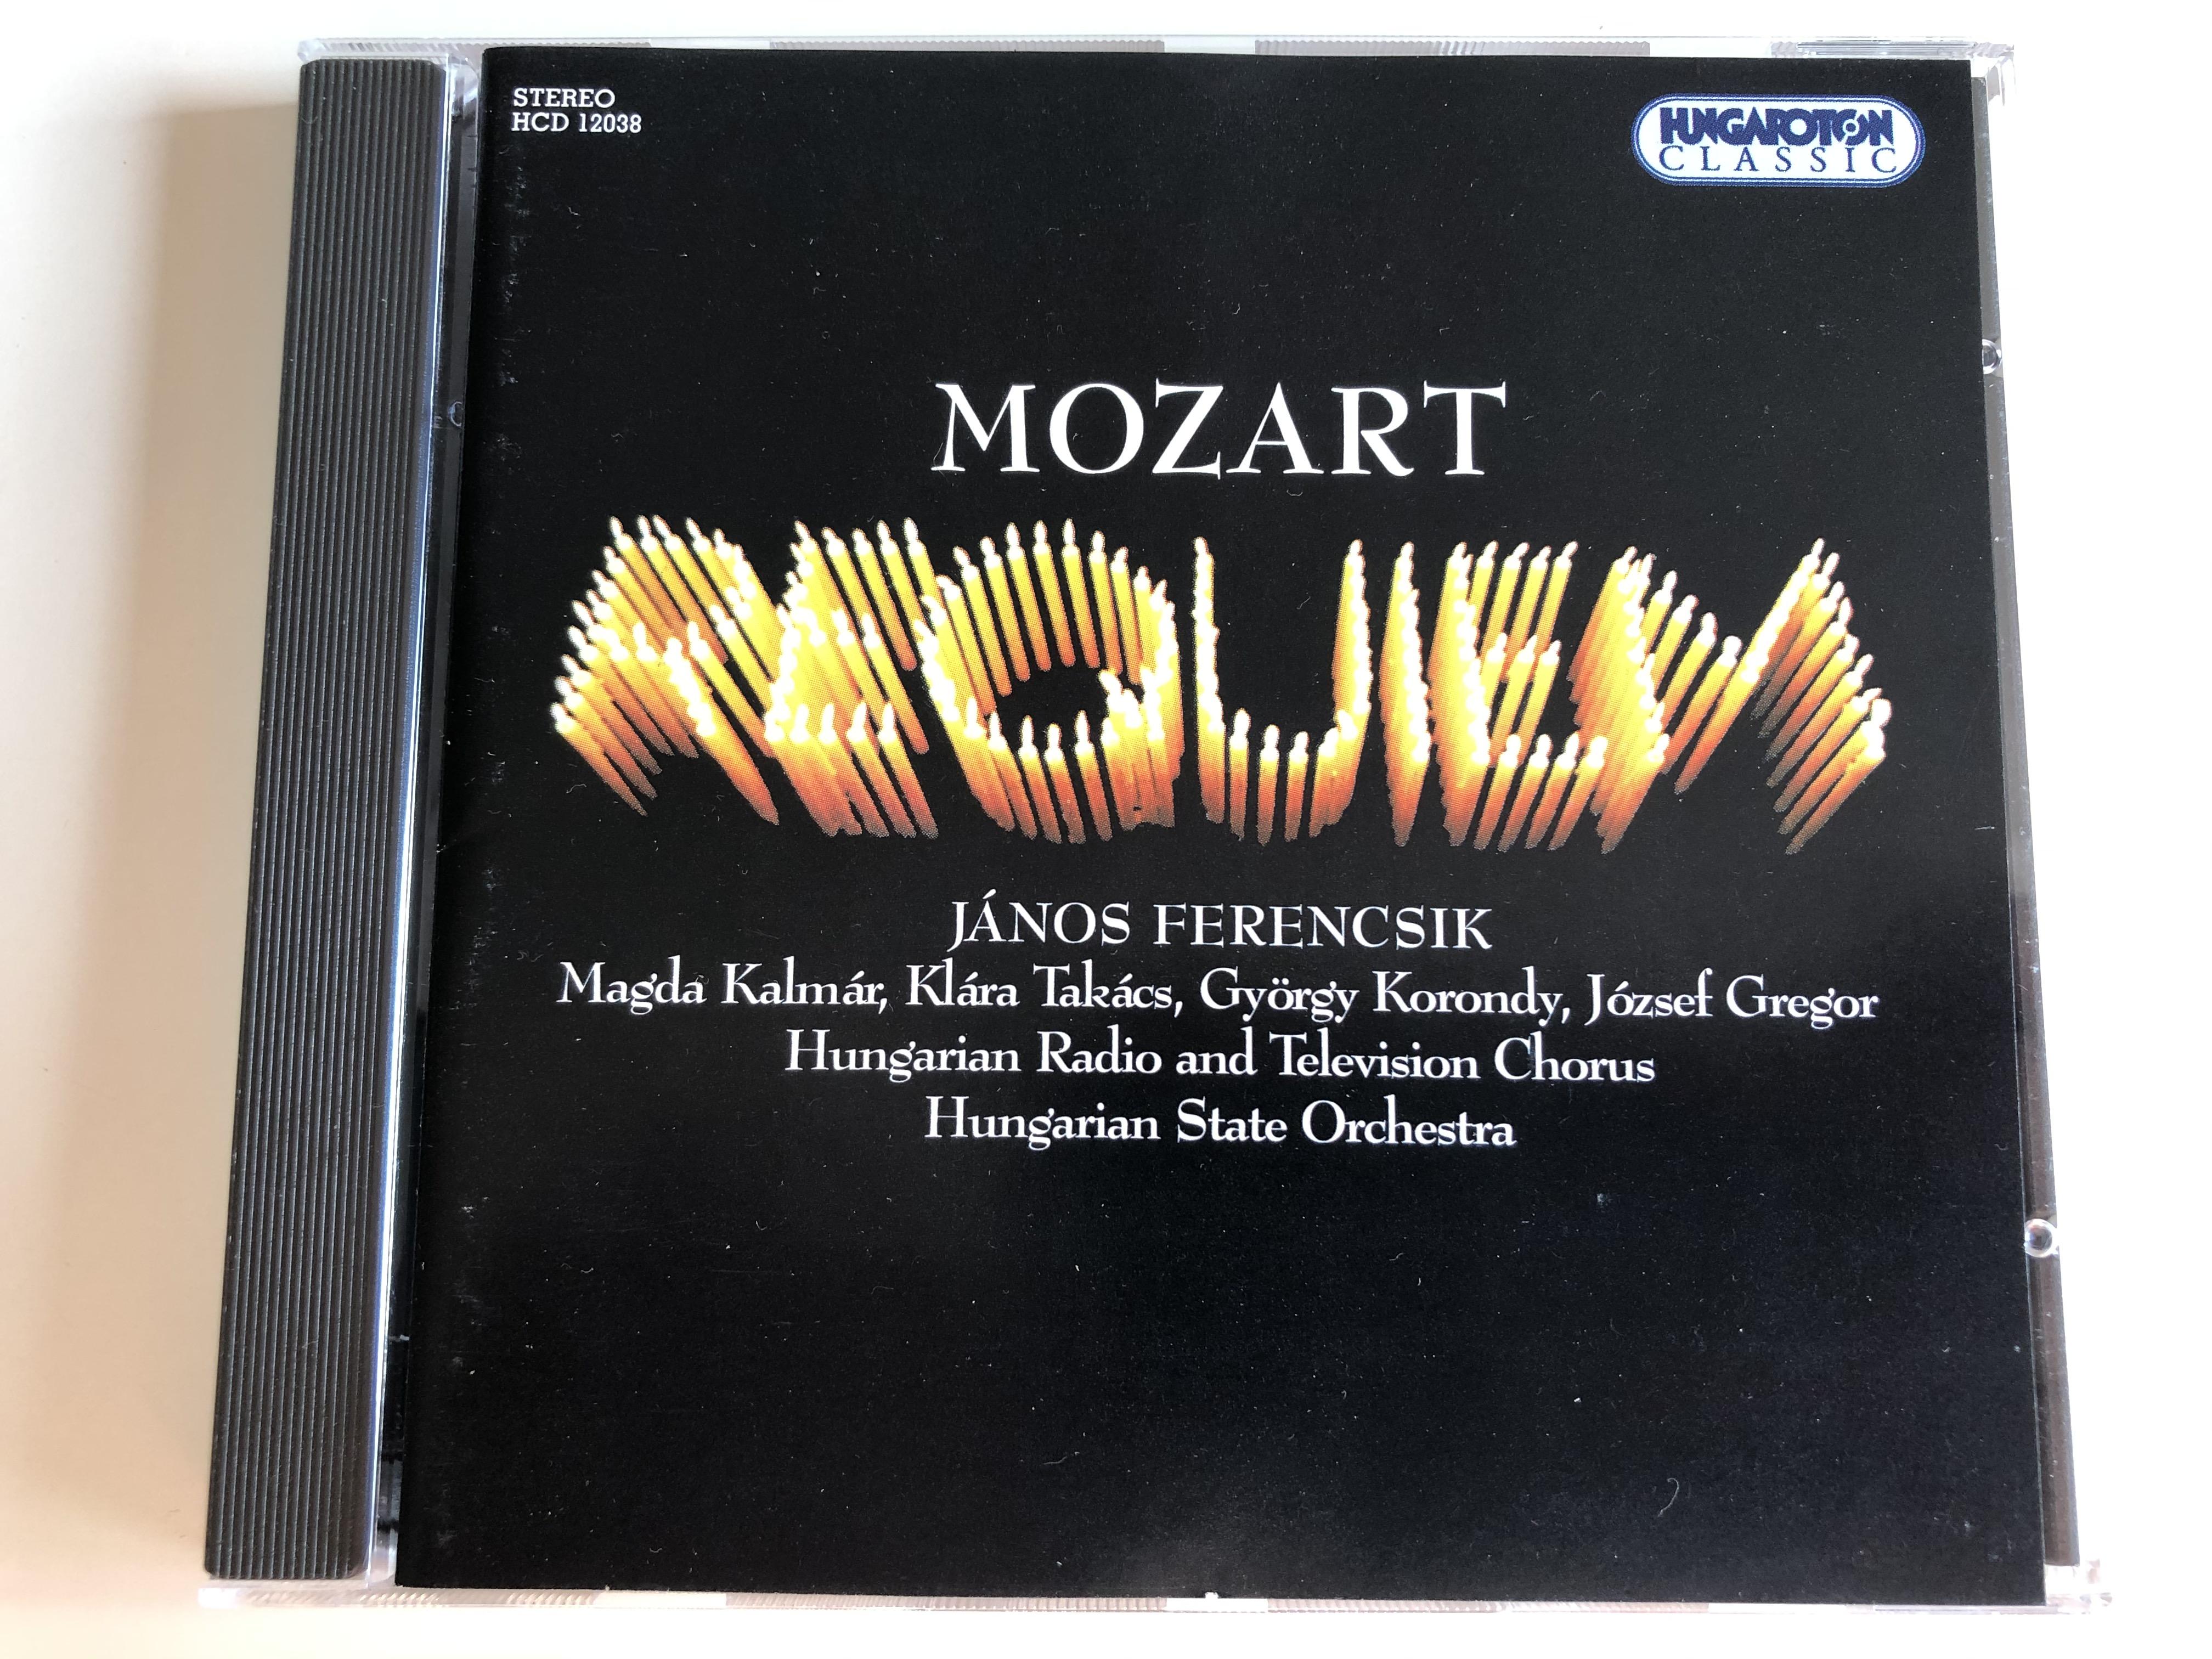 mozart-requiem-j-nos-ferencsik-magda-kalm-r-kl-ra-tak-cs-gy-rgy-korondy-j-zsef-gregor-hungarian-radio-and-television-chorus-hungarian-state-orchestra-hungaroton-classic-audio-cd-1994-1-.jpg